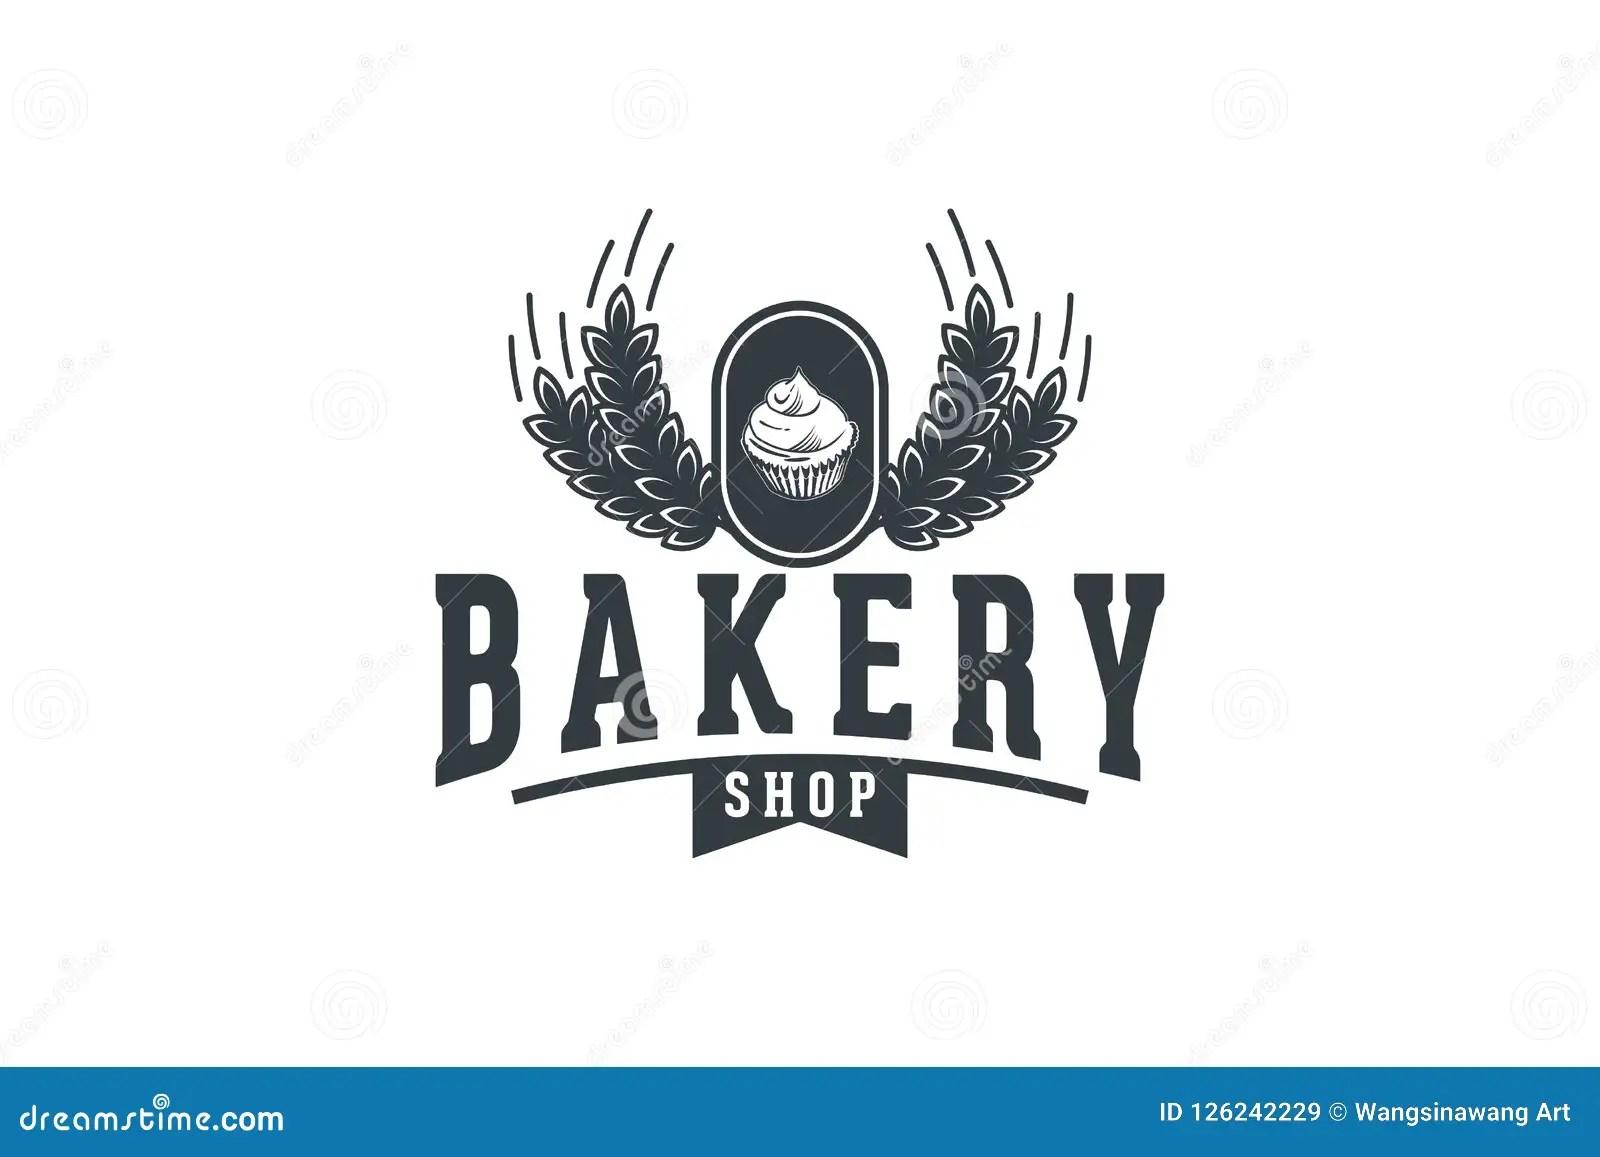 Cupcake And Wheat Vintage Bakery Shop Logo Design Inspiration Stock